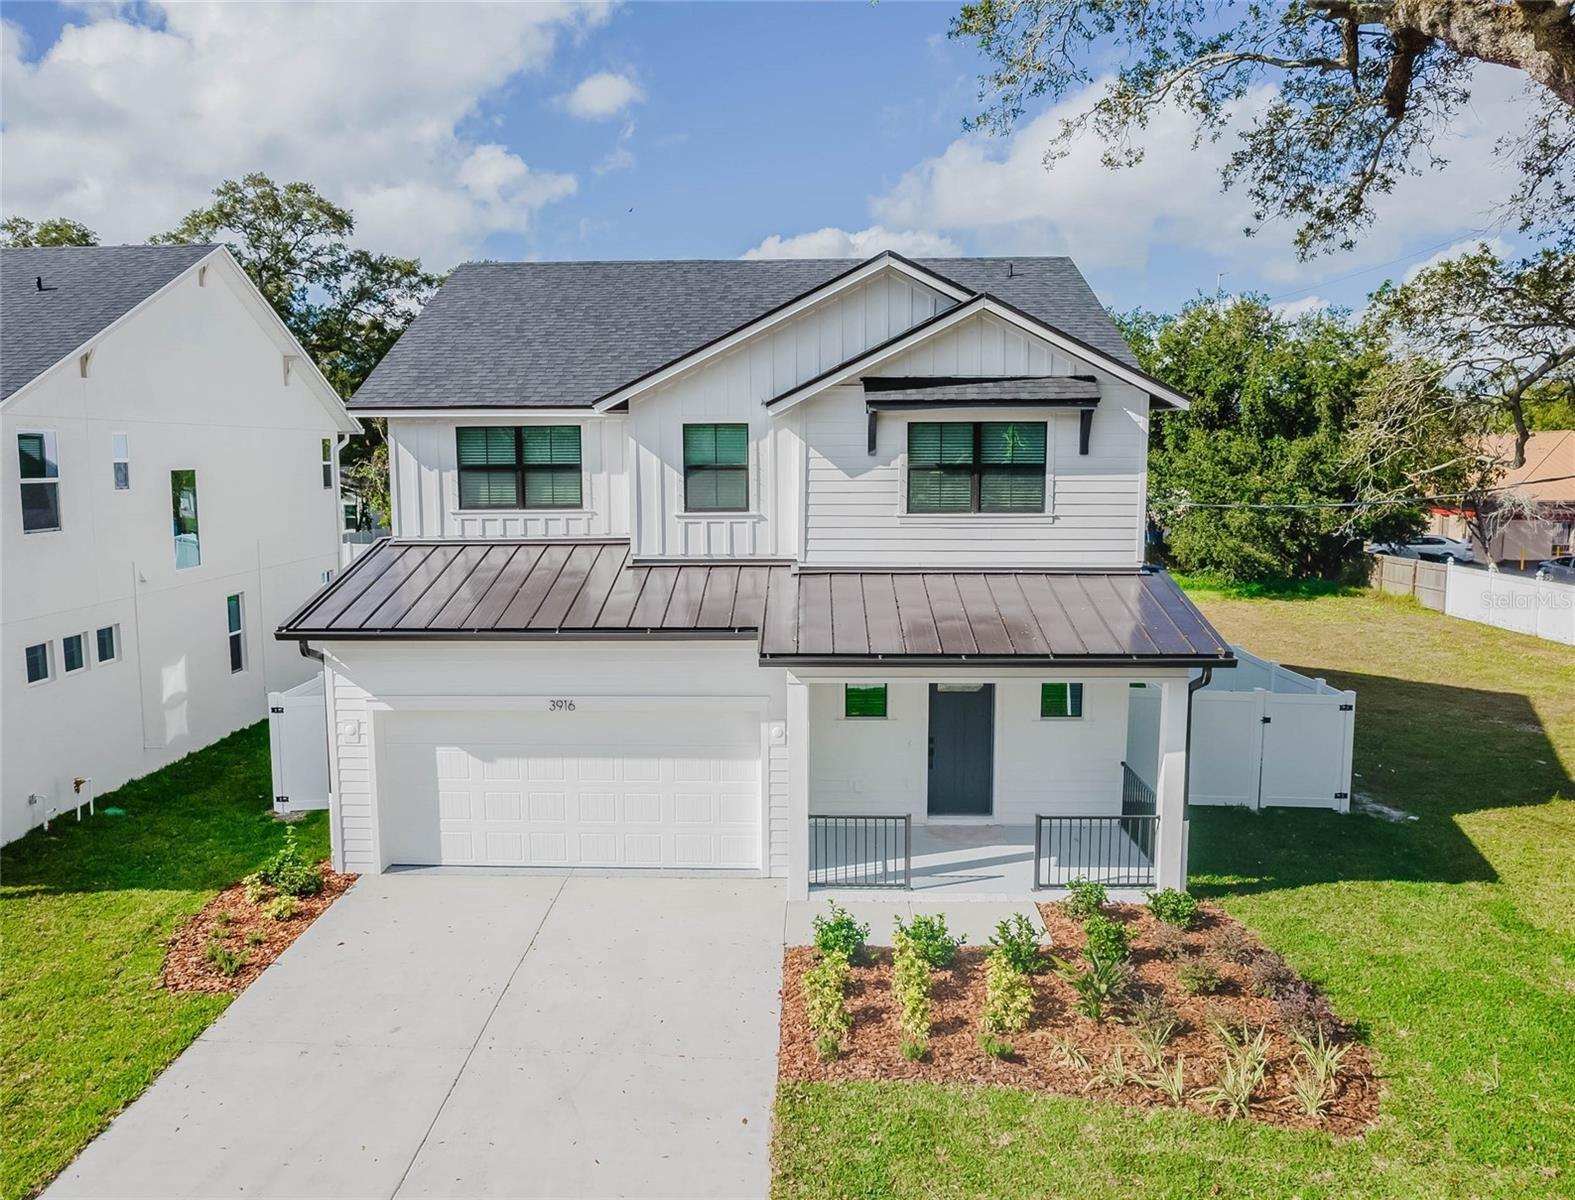 3916 N DARWIN AVENUE, Tampa, FL 33603 - #: T3300783